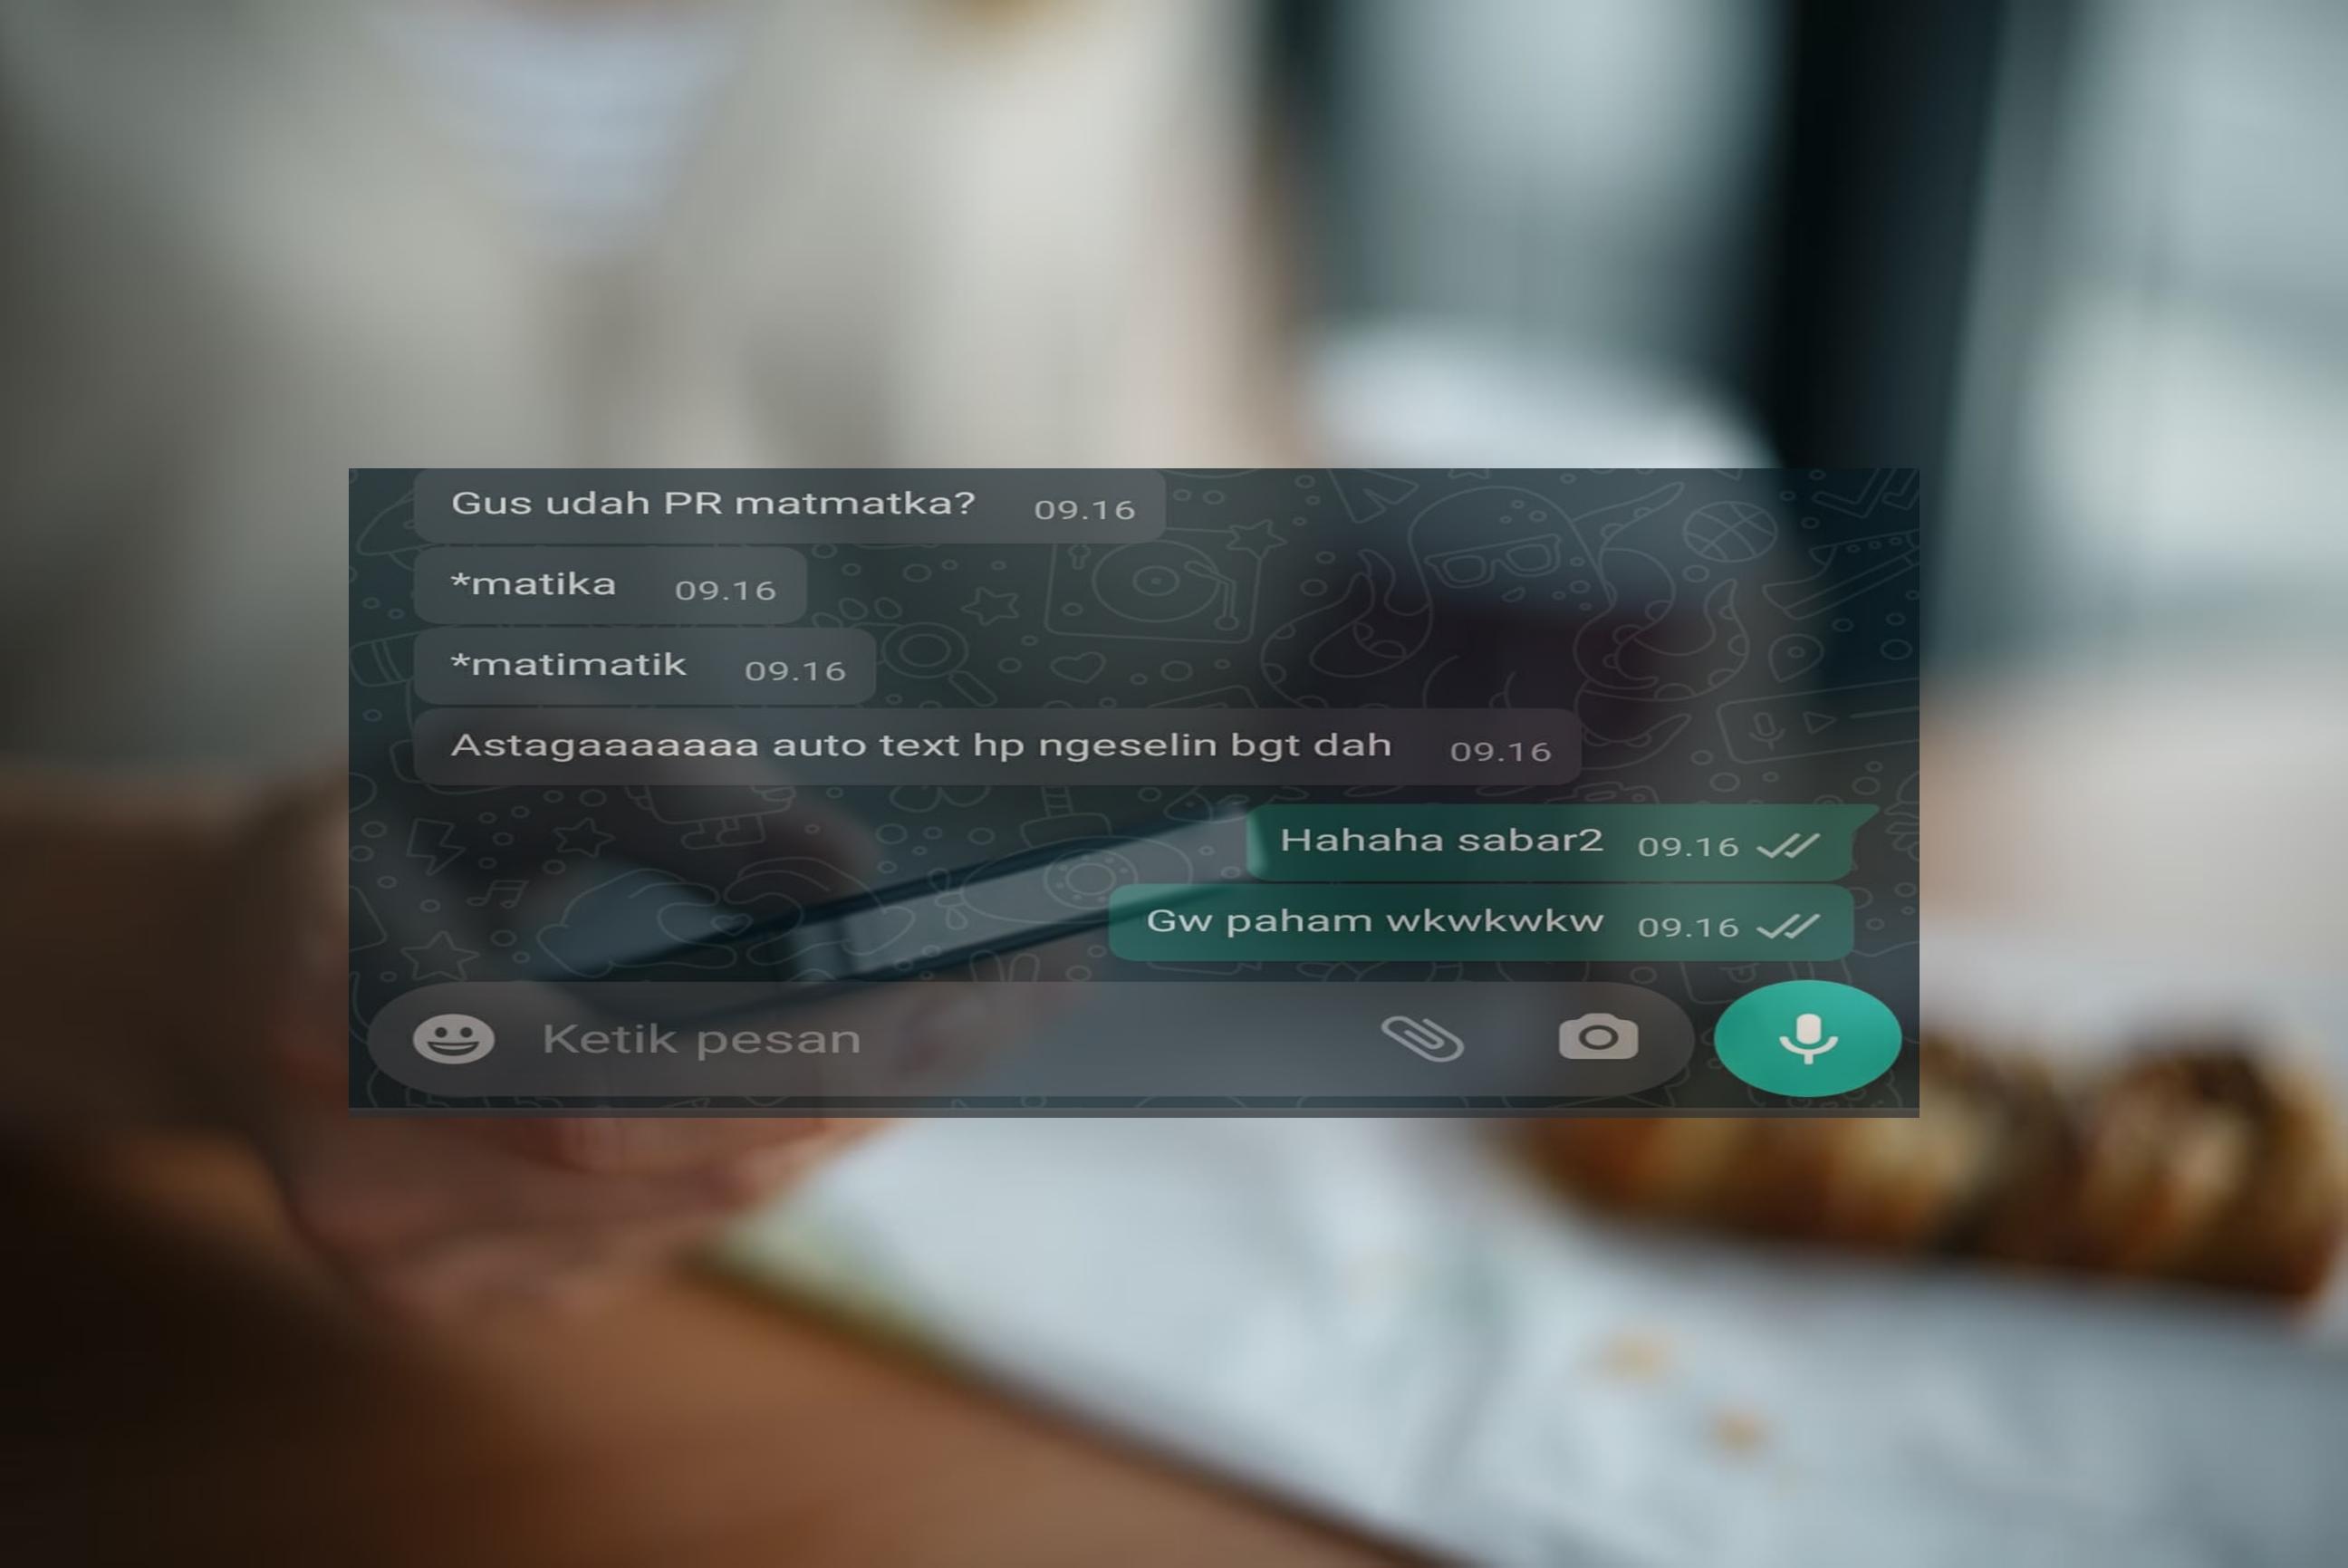 8 Chat typo saat bahas tugas ini bikin gagal paham